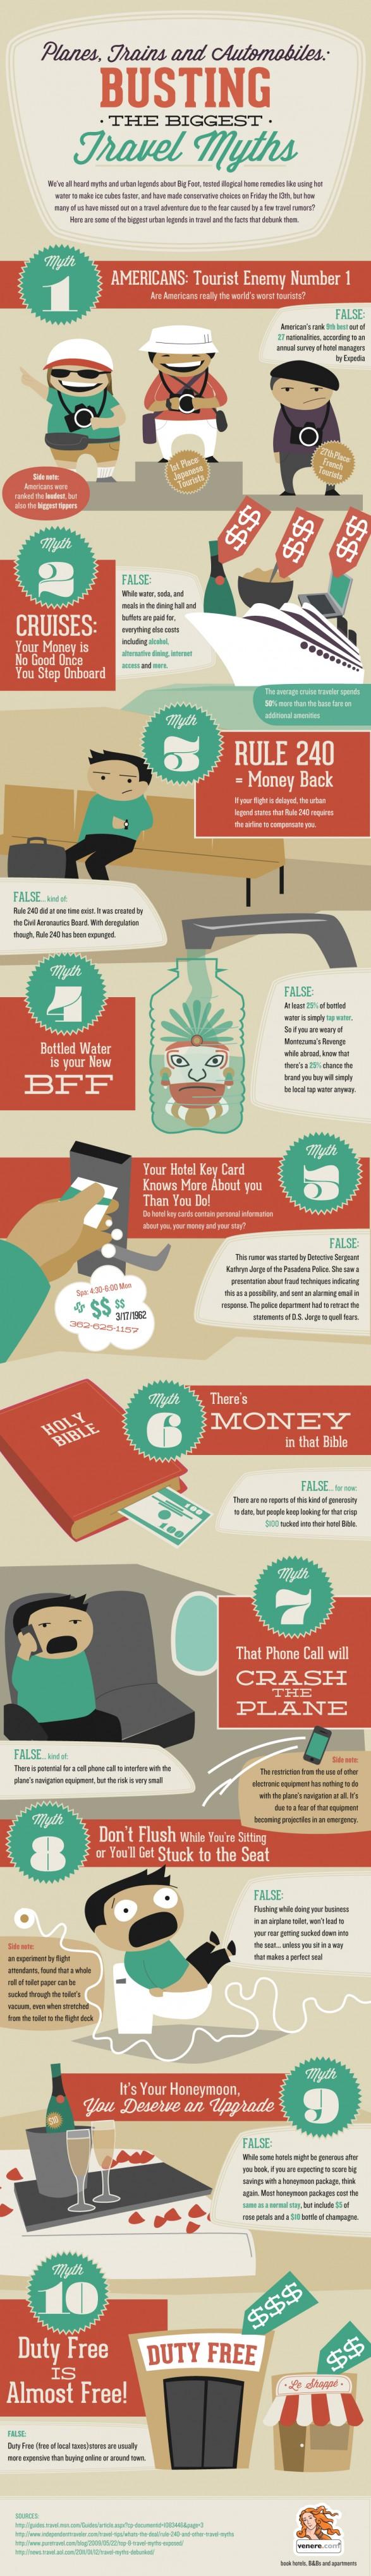 Biggest Travel Myths-Infographic